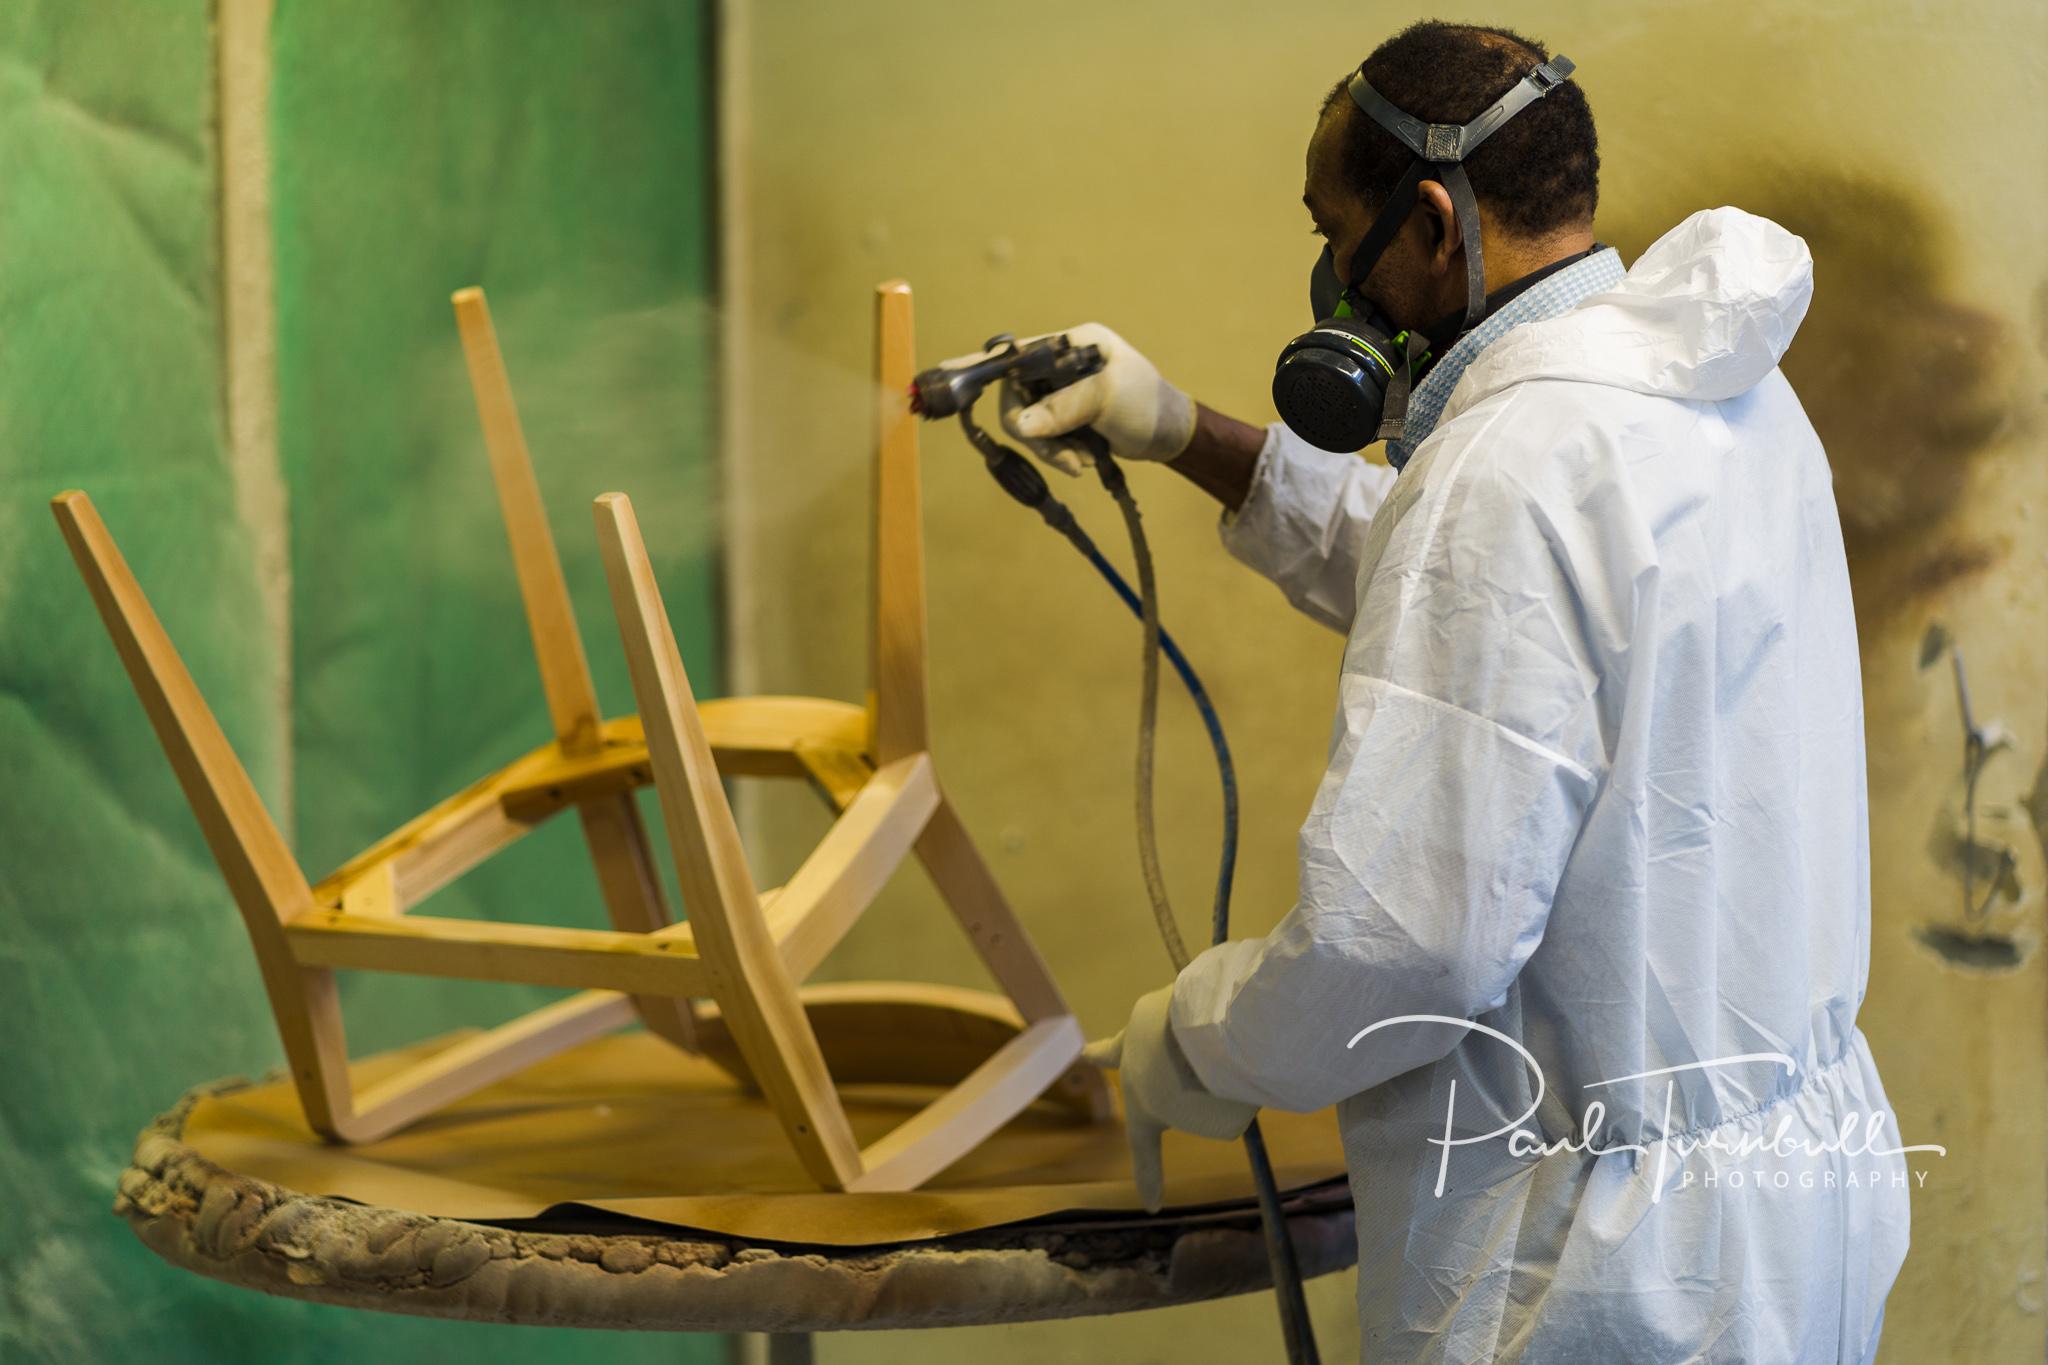 commercial-photographer-leeds-bradford-knightsbridge-furniture-tour-027.jpg